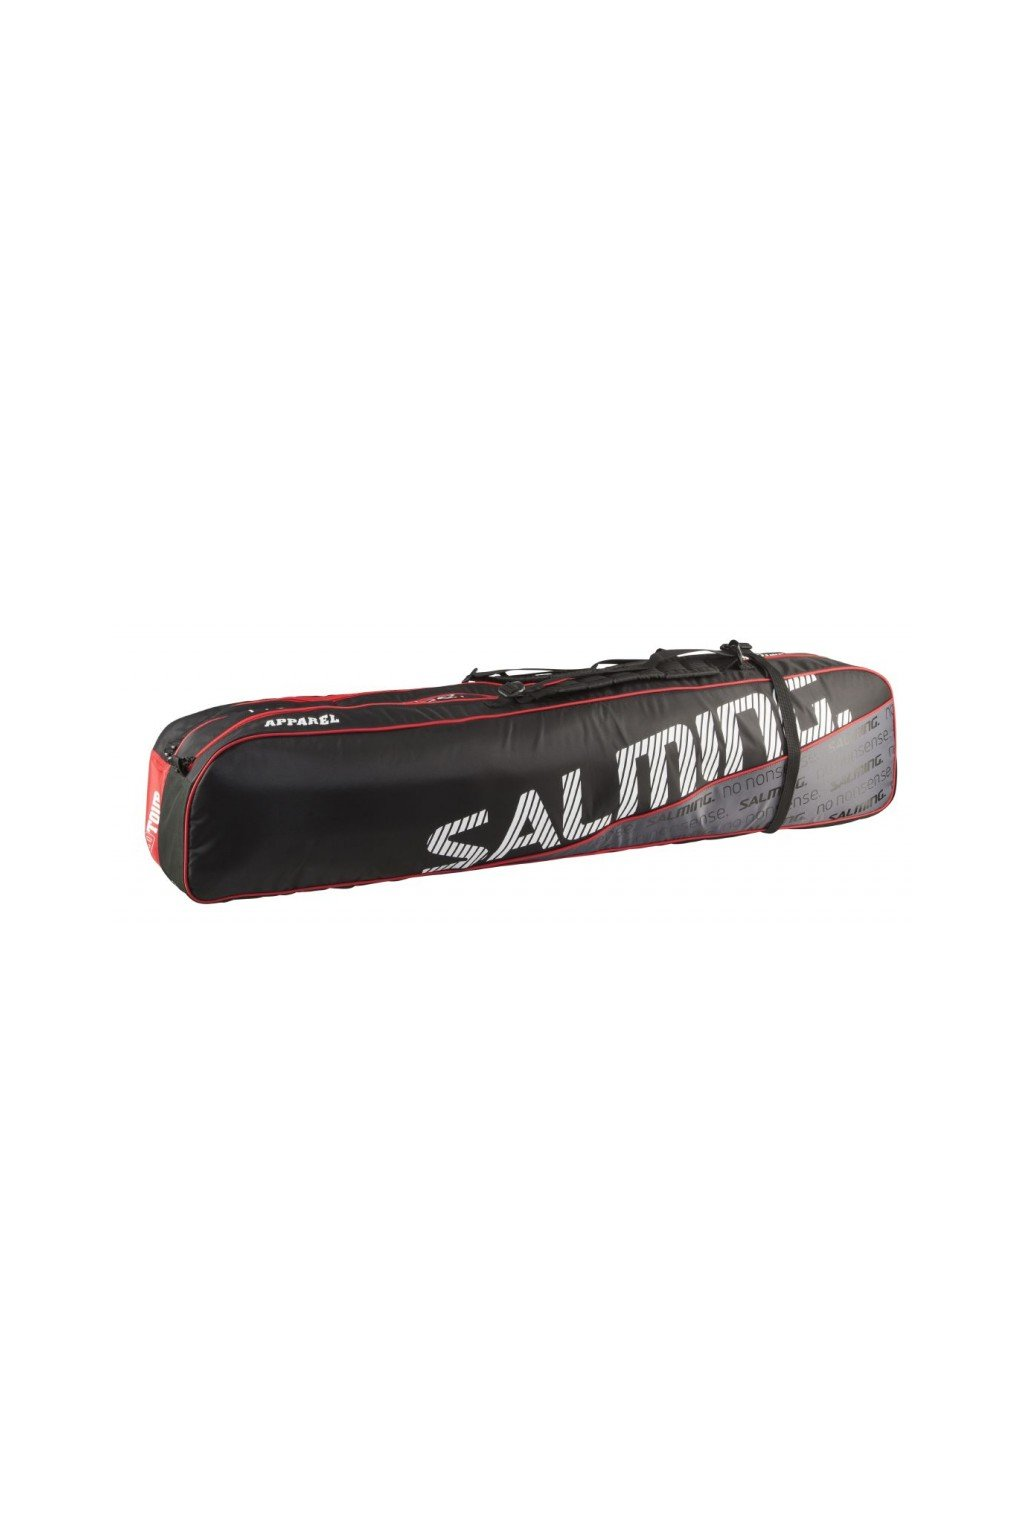 salming pro tour toolbag sr black red